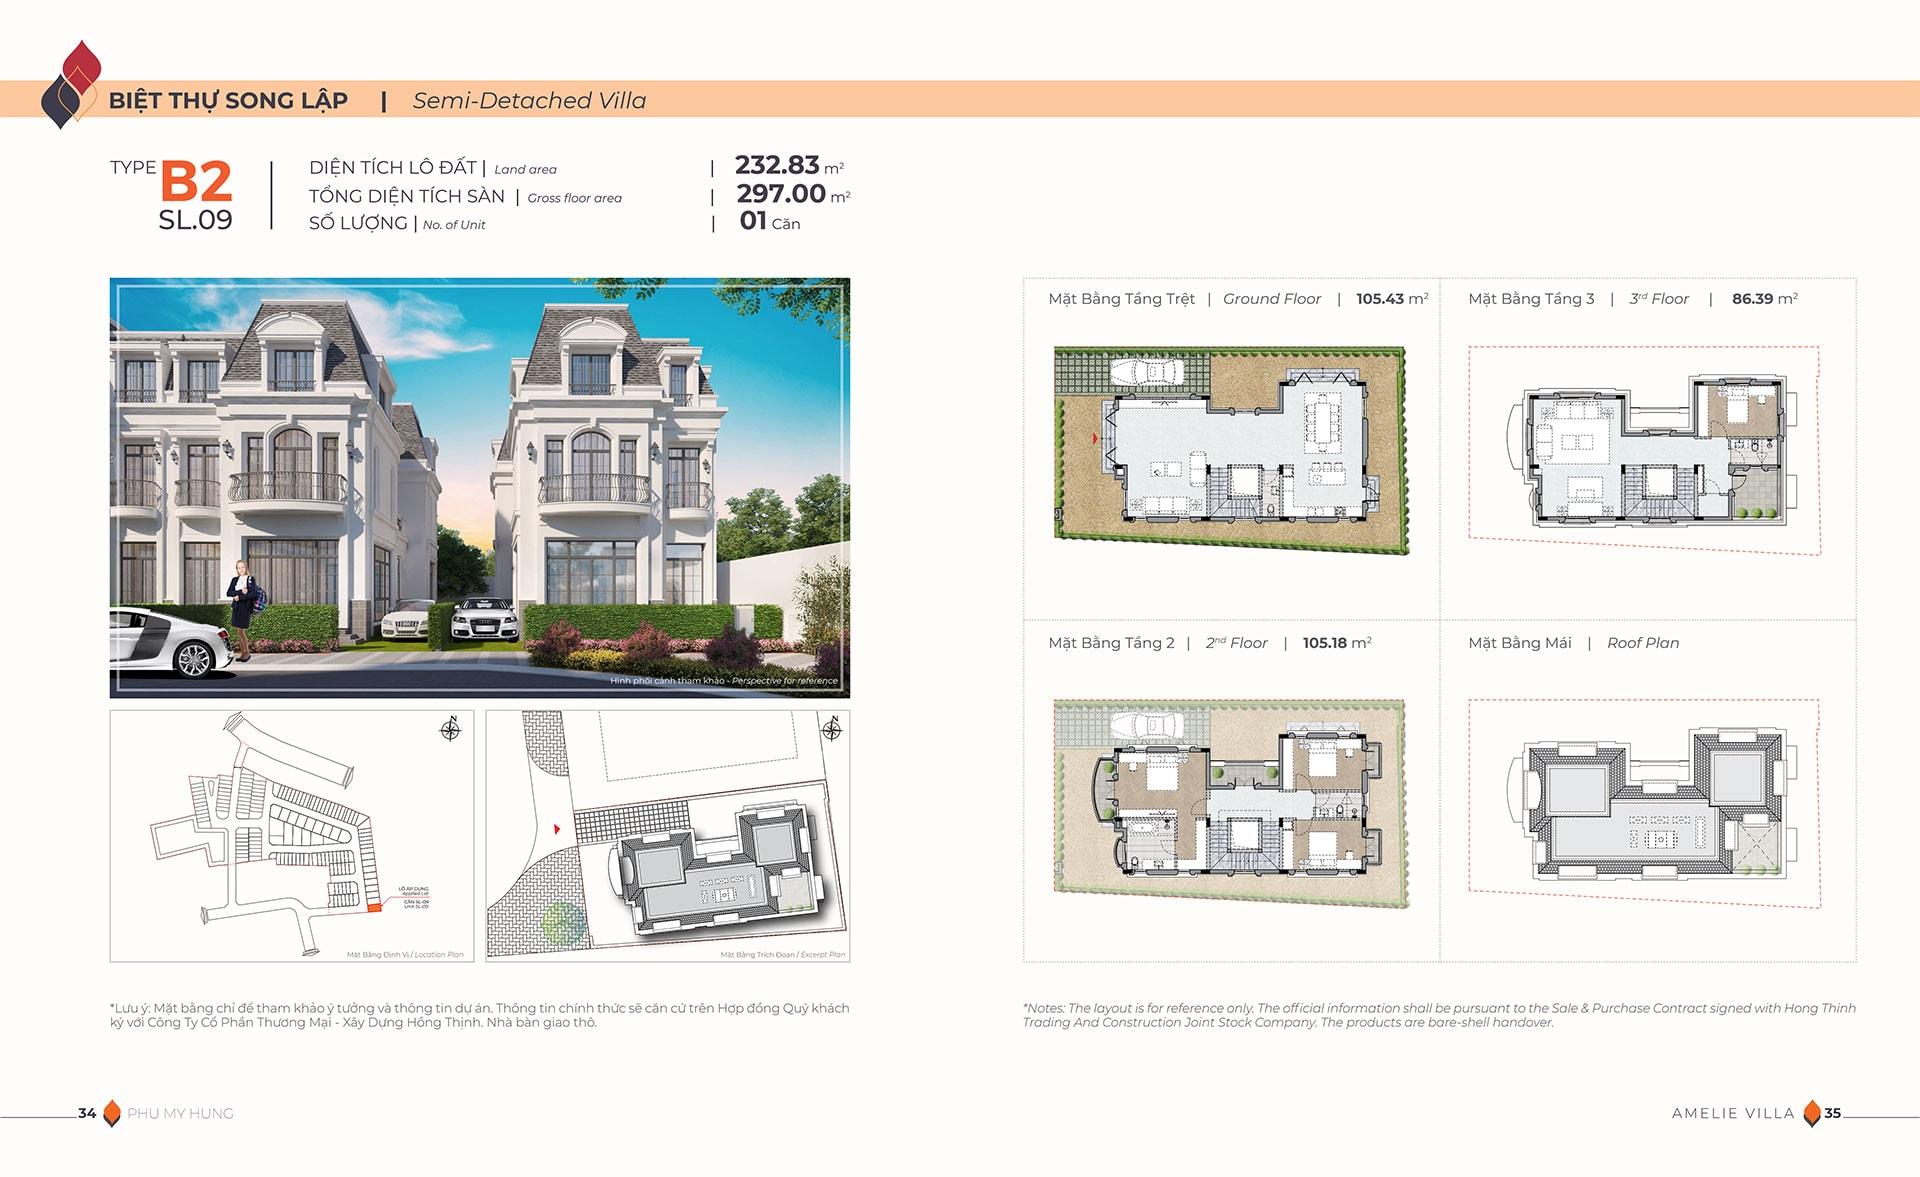 Mặt bằng biệt thự song lập Amelie Villa type B2